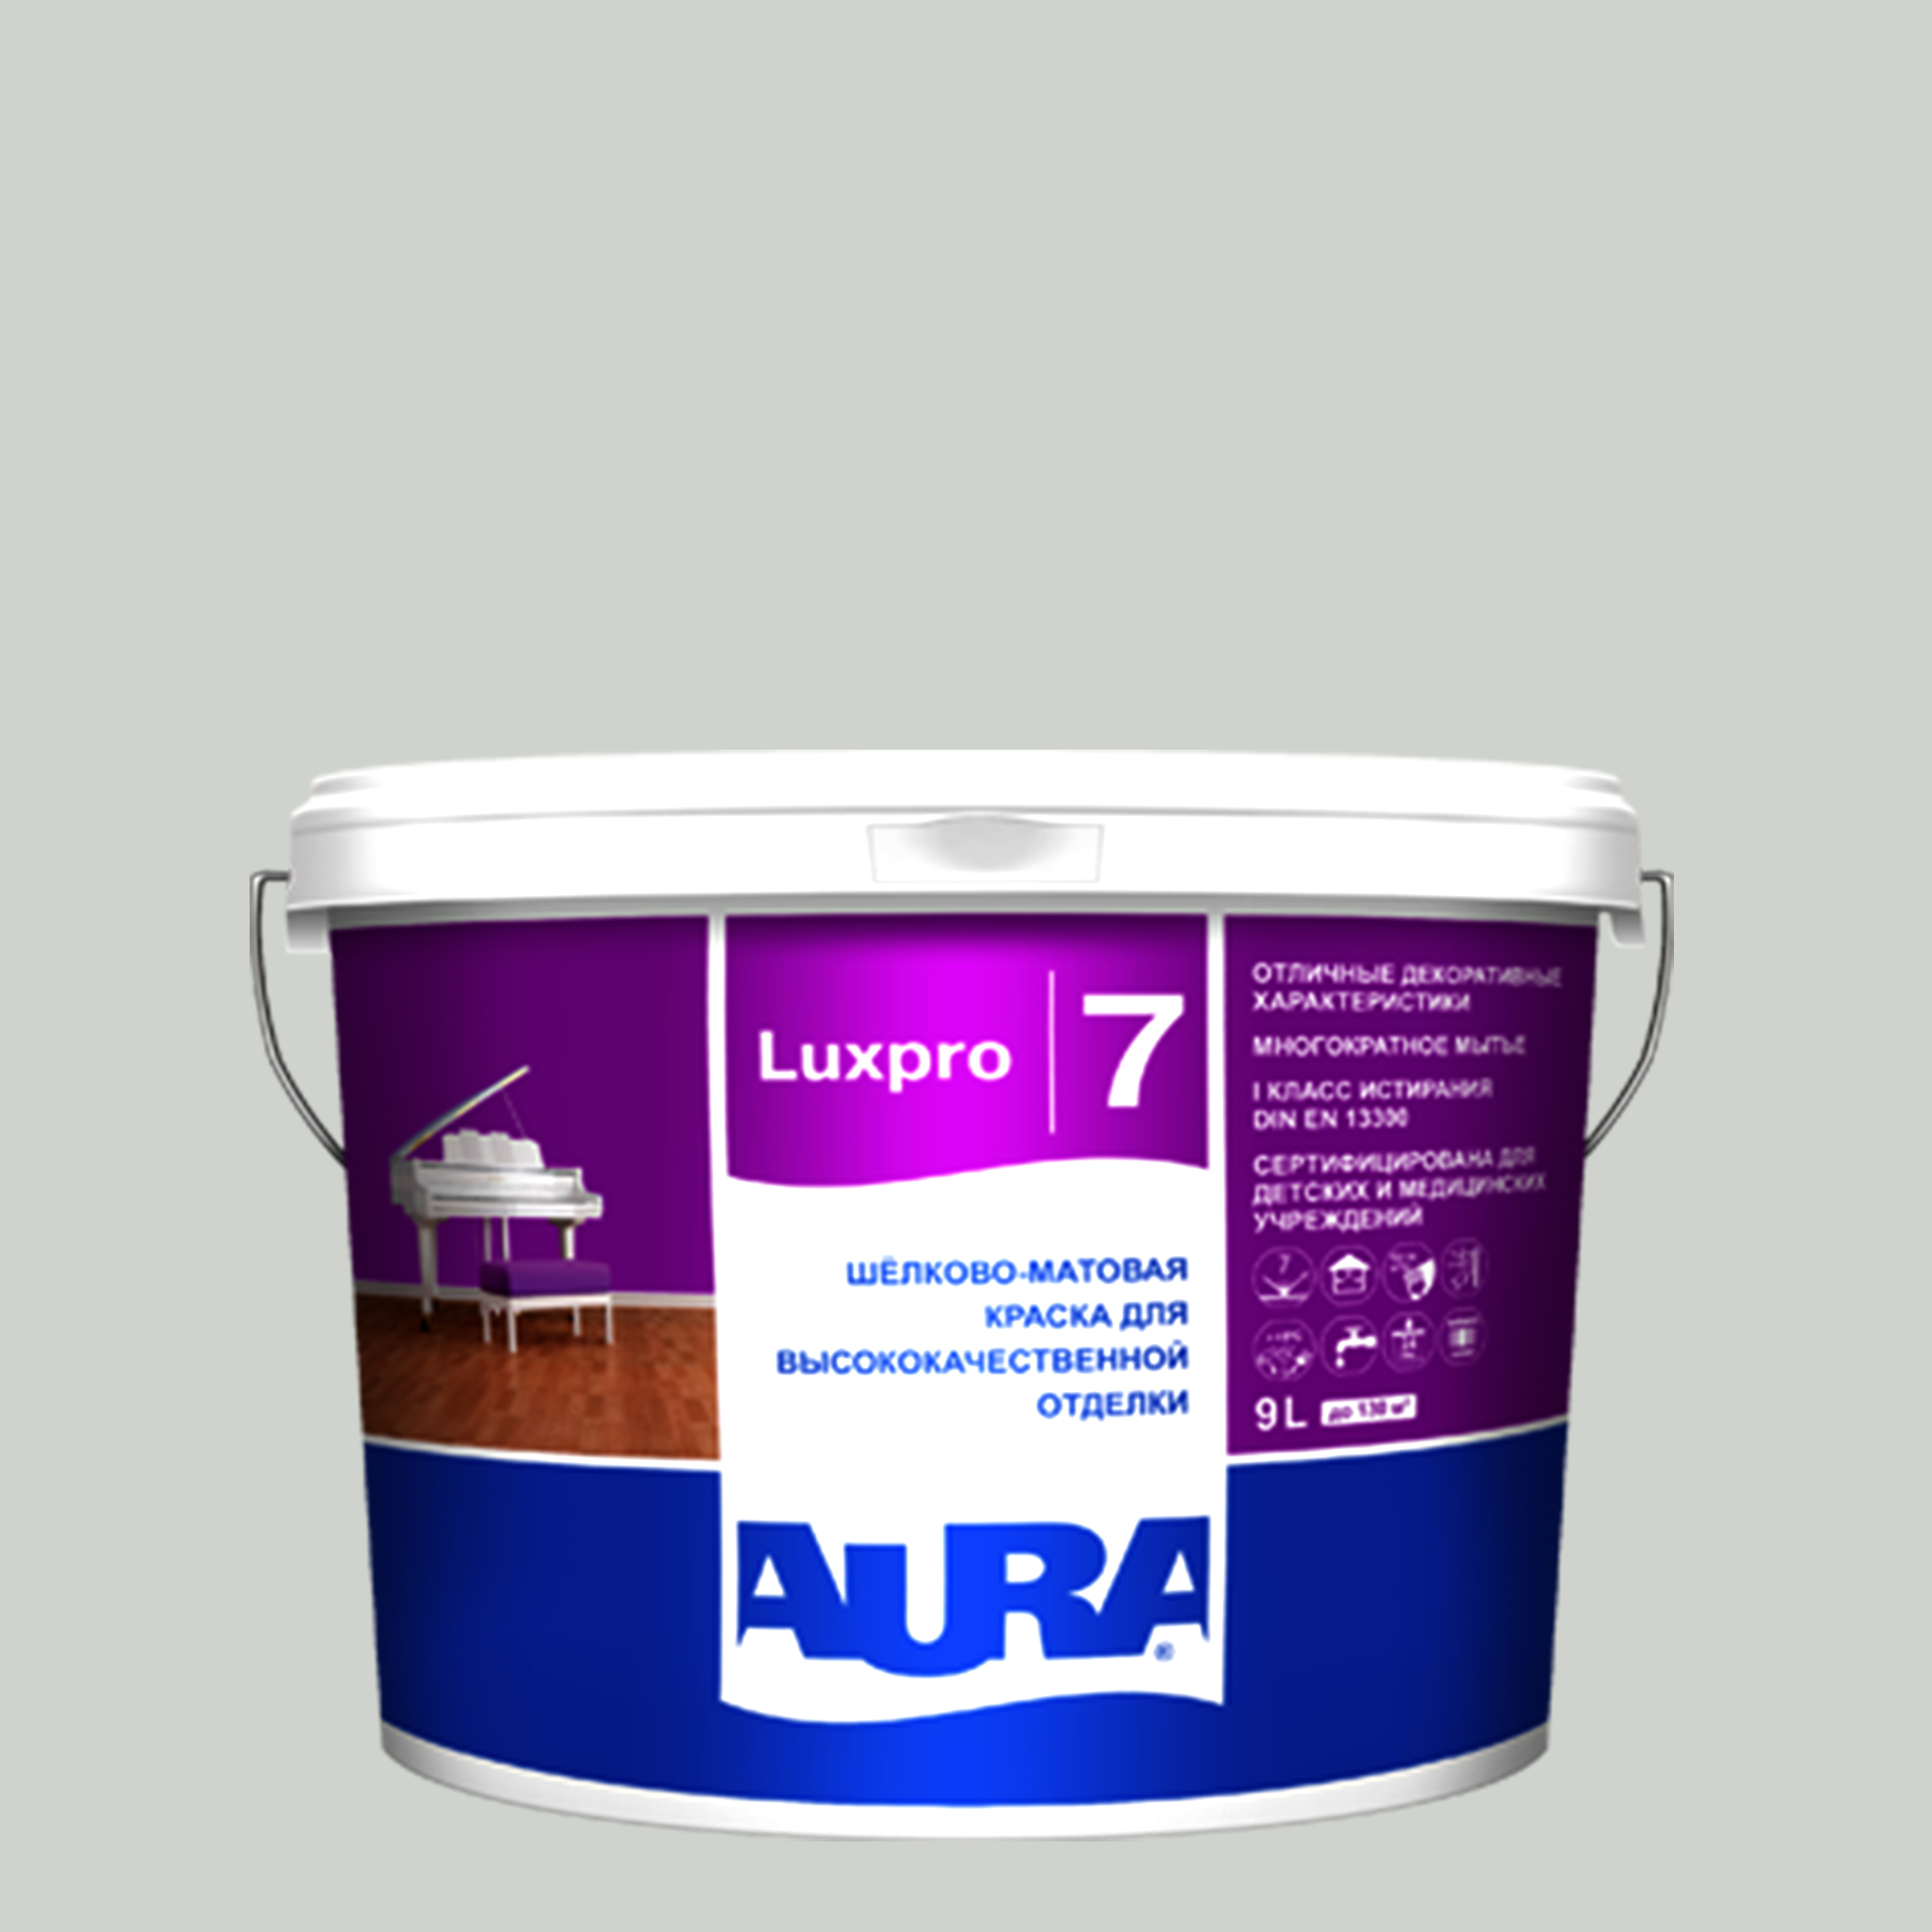 Фото 4 - Краска интерьерная, Aura LuxPRO 7, RAL 6027, 11 кг.